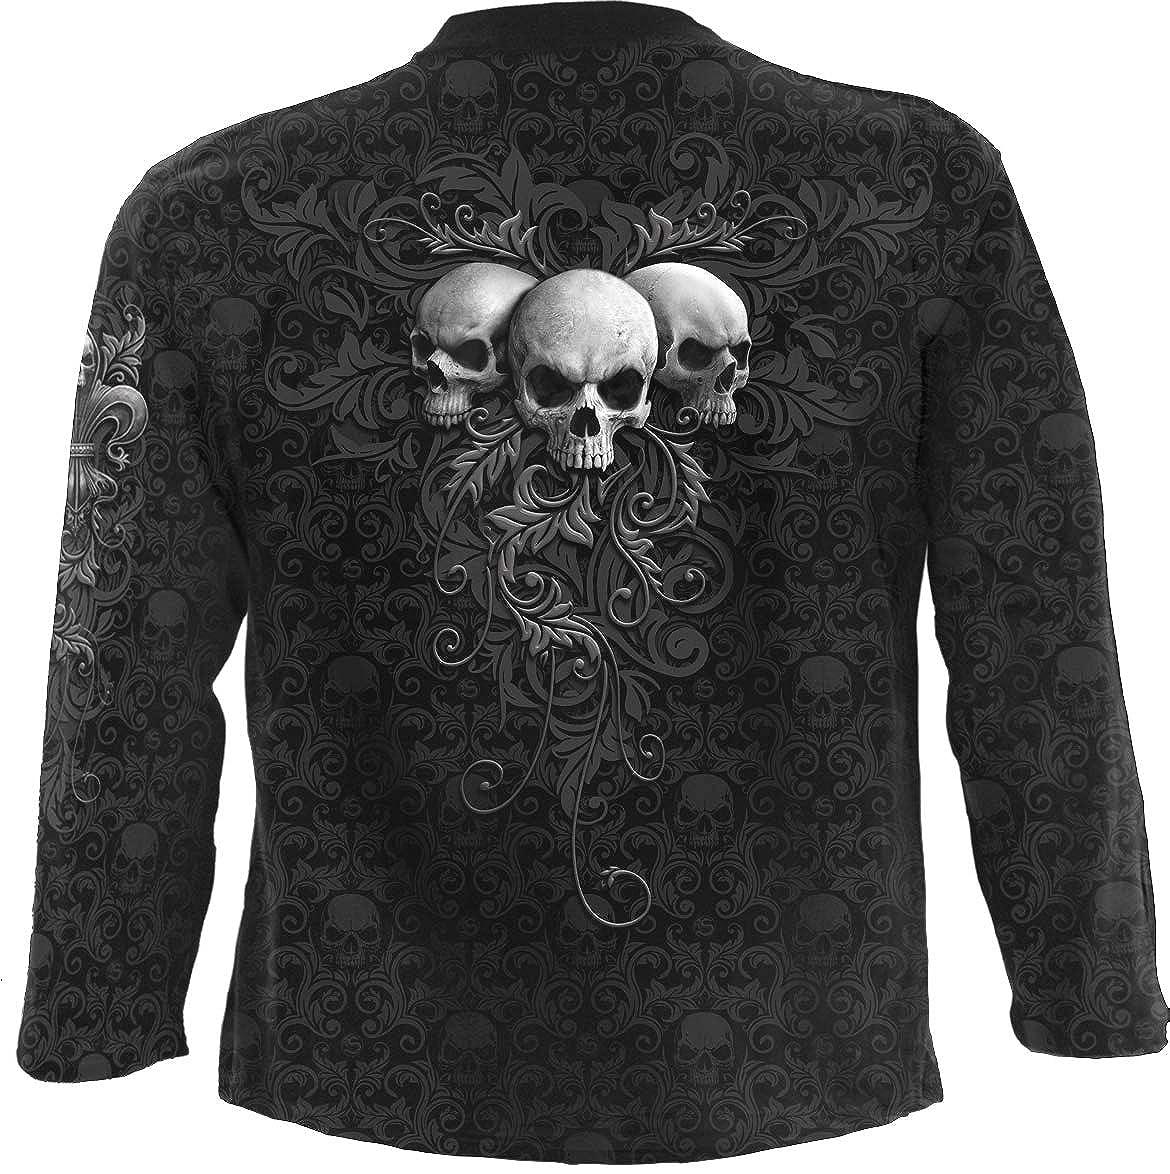 Skull Scroll Scroll Impression Longsleeve T-Shirt Black Spiral